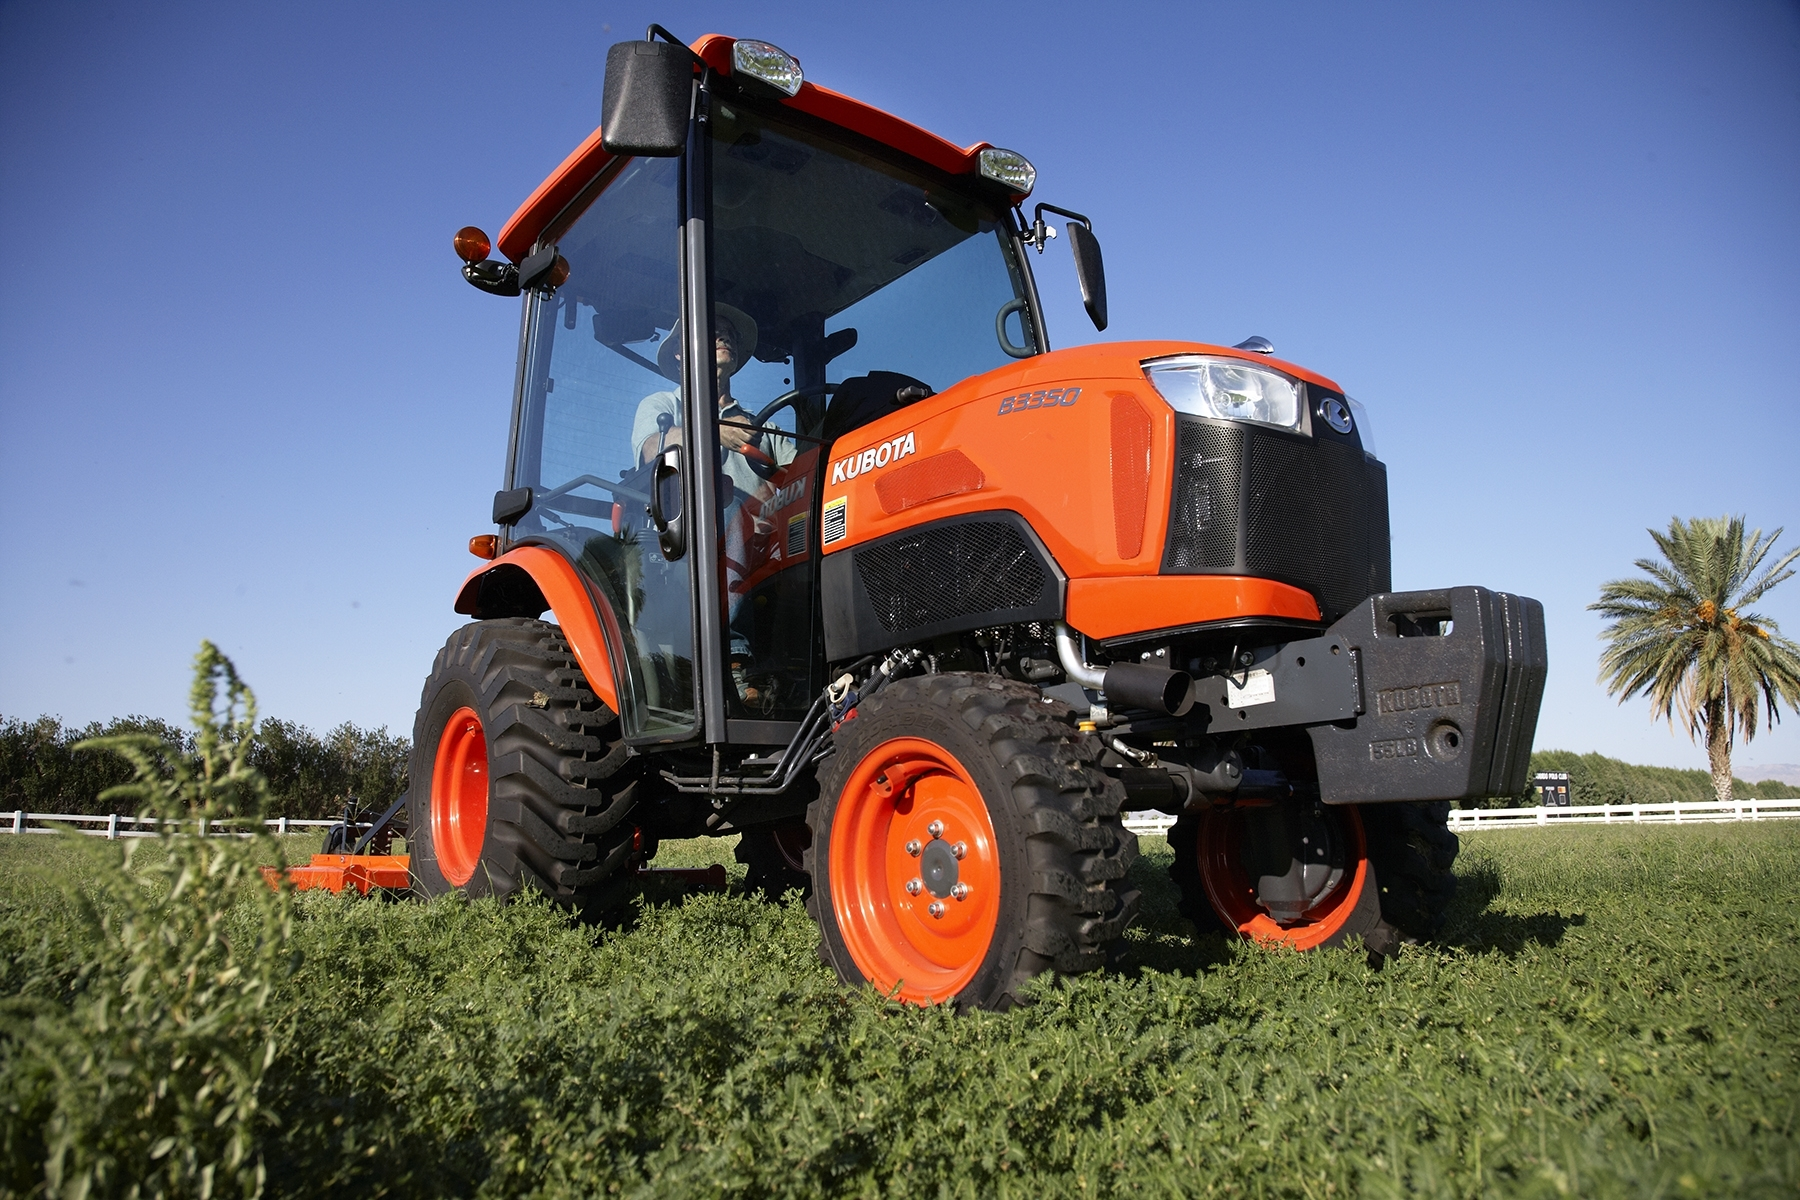 small resolution of kubota unveils new b50 series tractors with factory integrated cabs ferrari electrical wiring diagram electrical wiring diagram kubota b2650